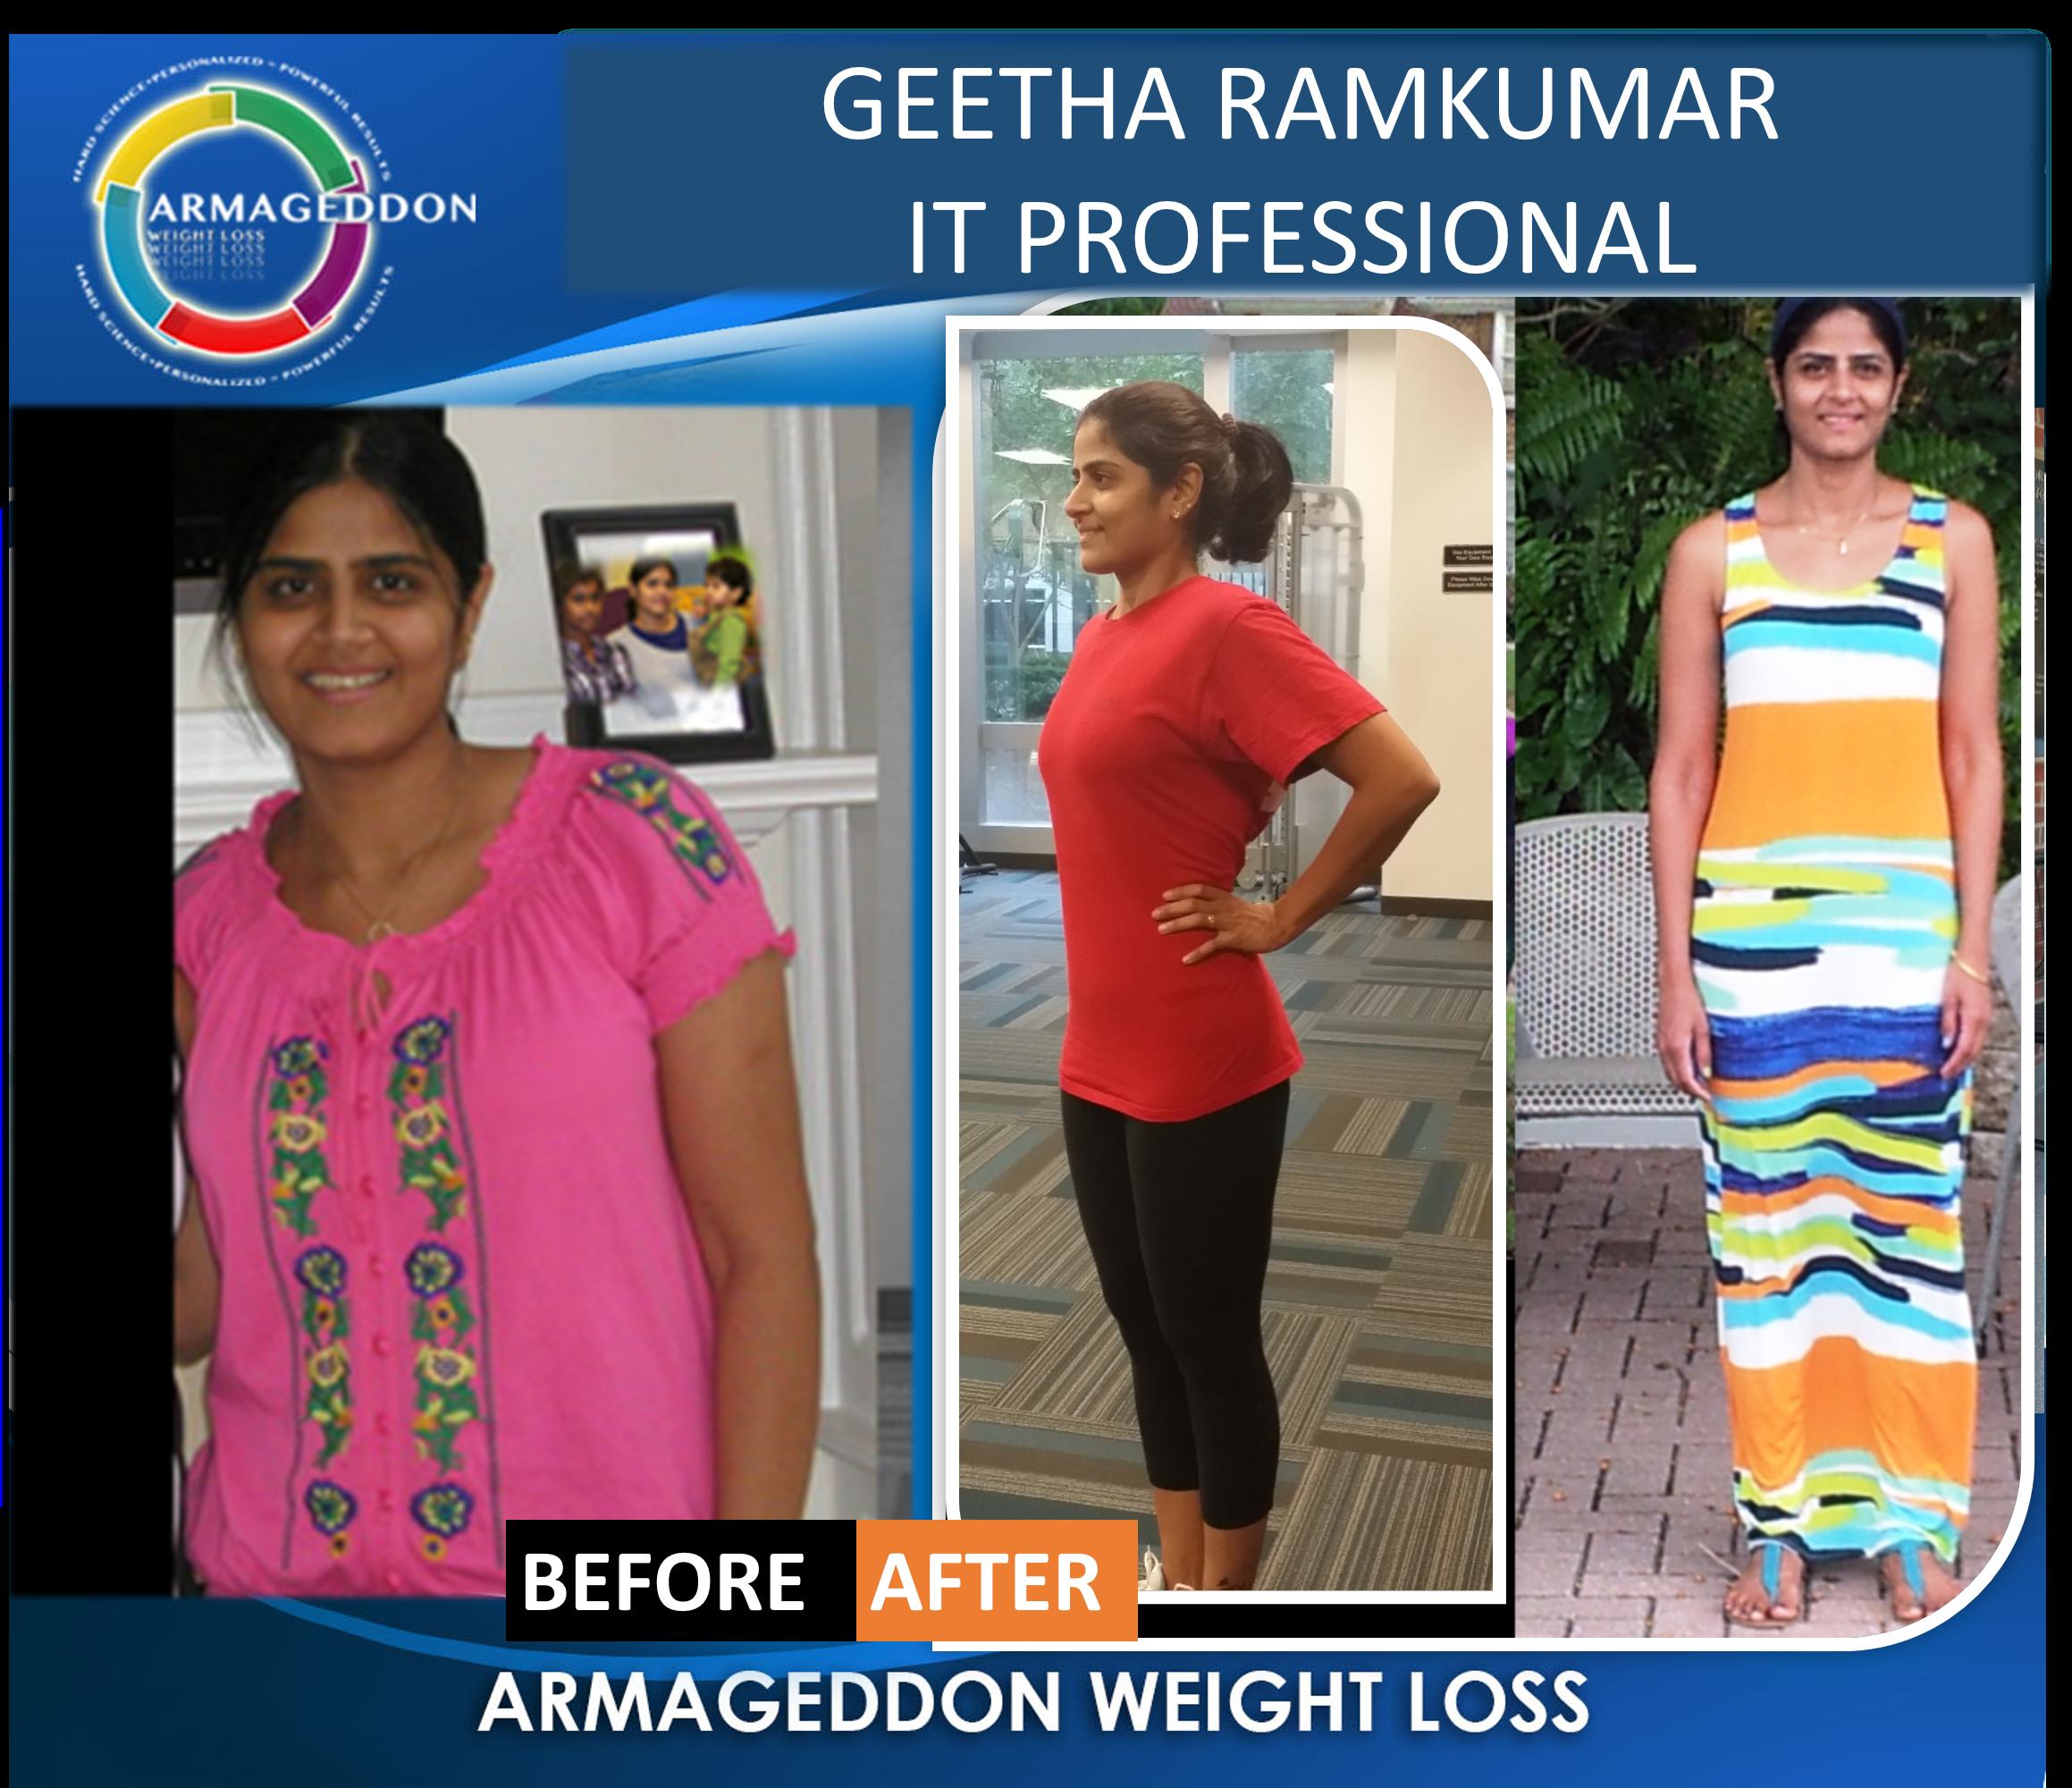 Geetha Ramkumar IT Professional - Infor - Armageddon Weight Loss - Best weight loss DVD for women, best exercise program for women-3